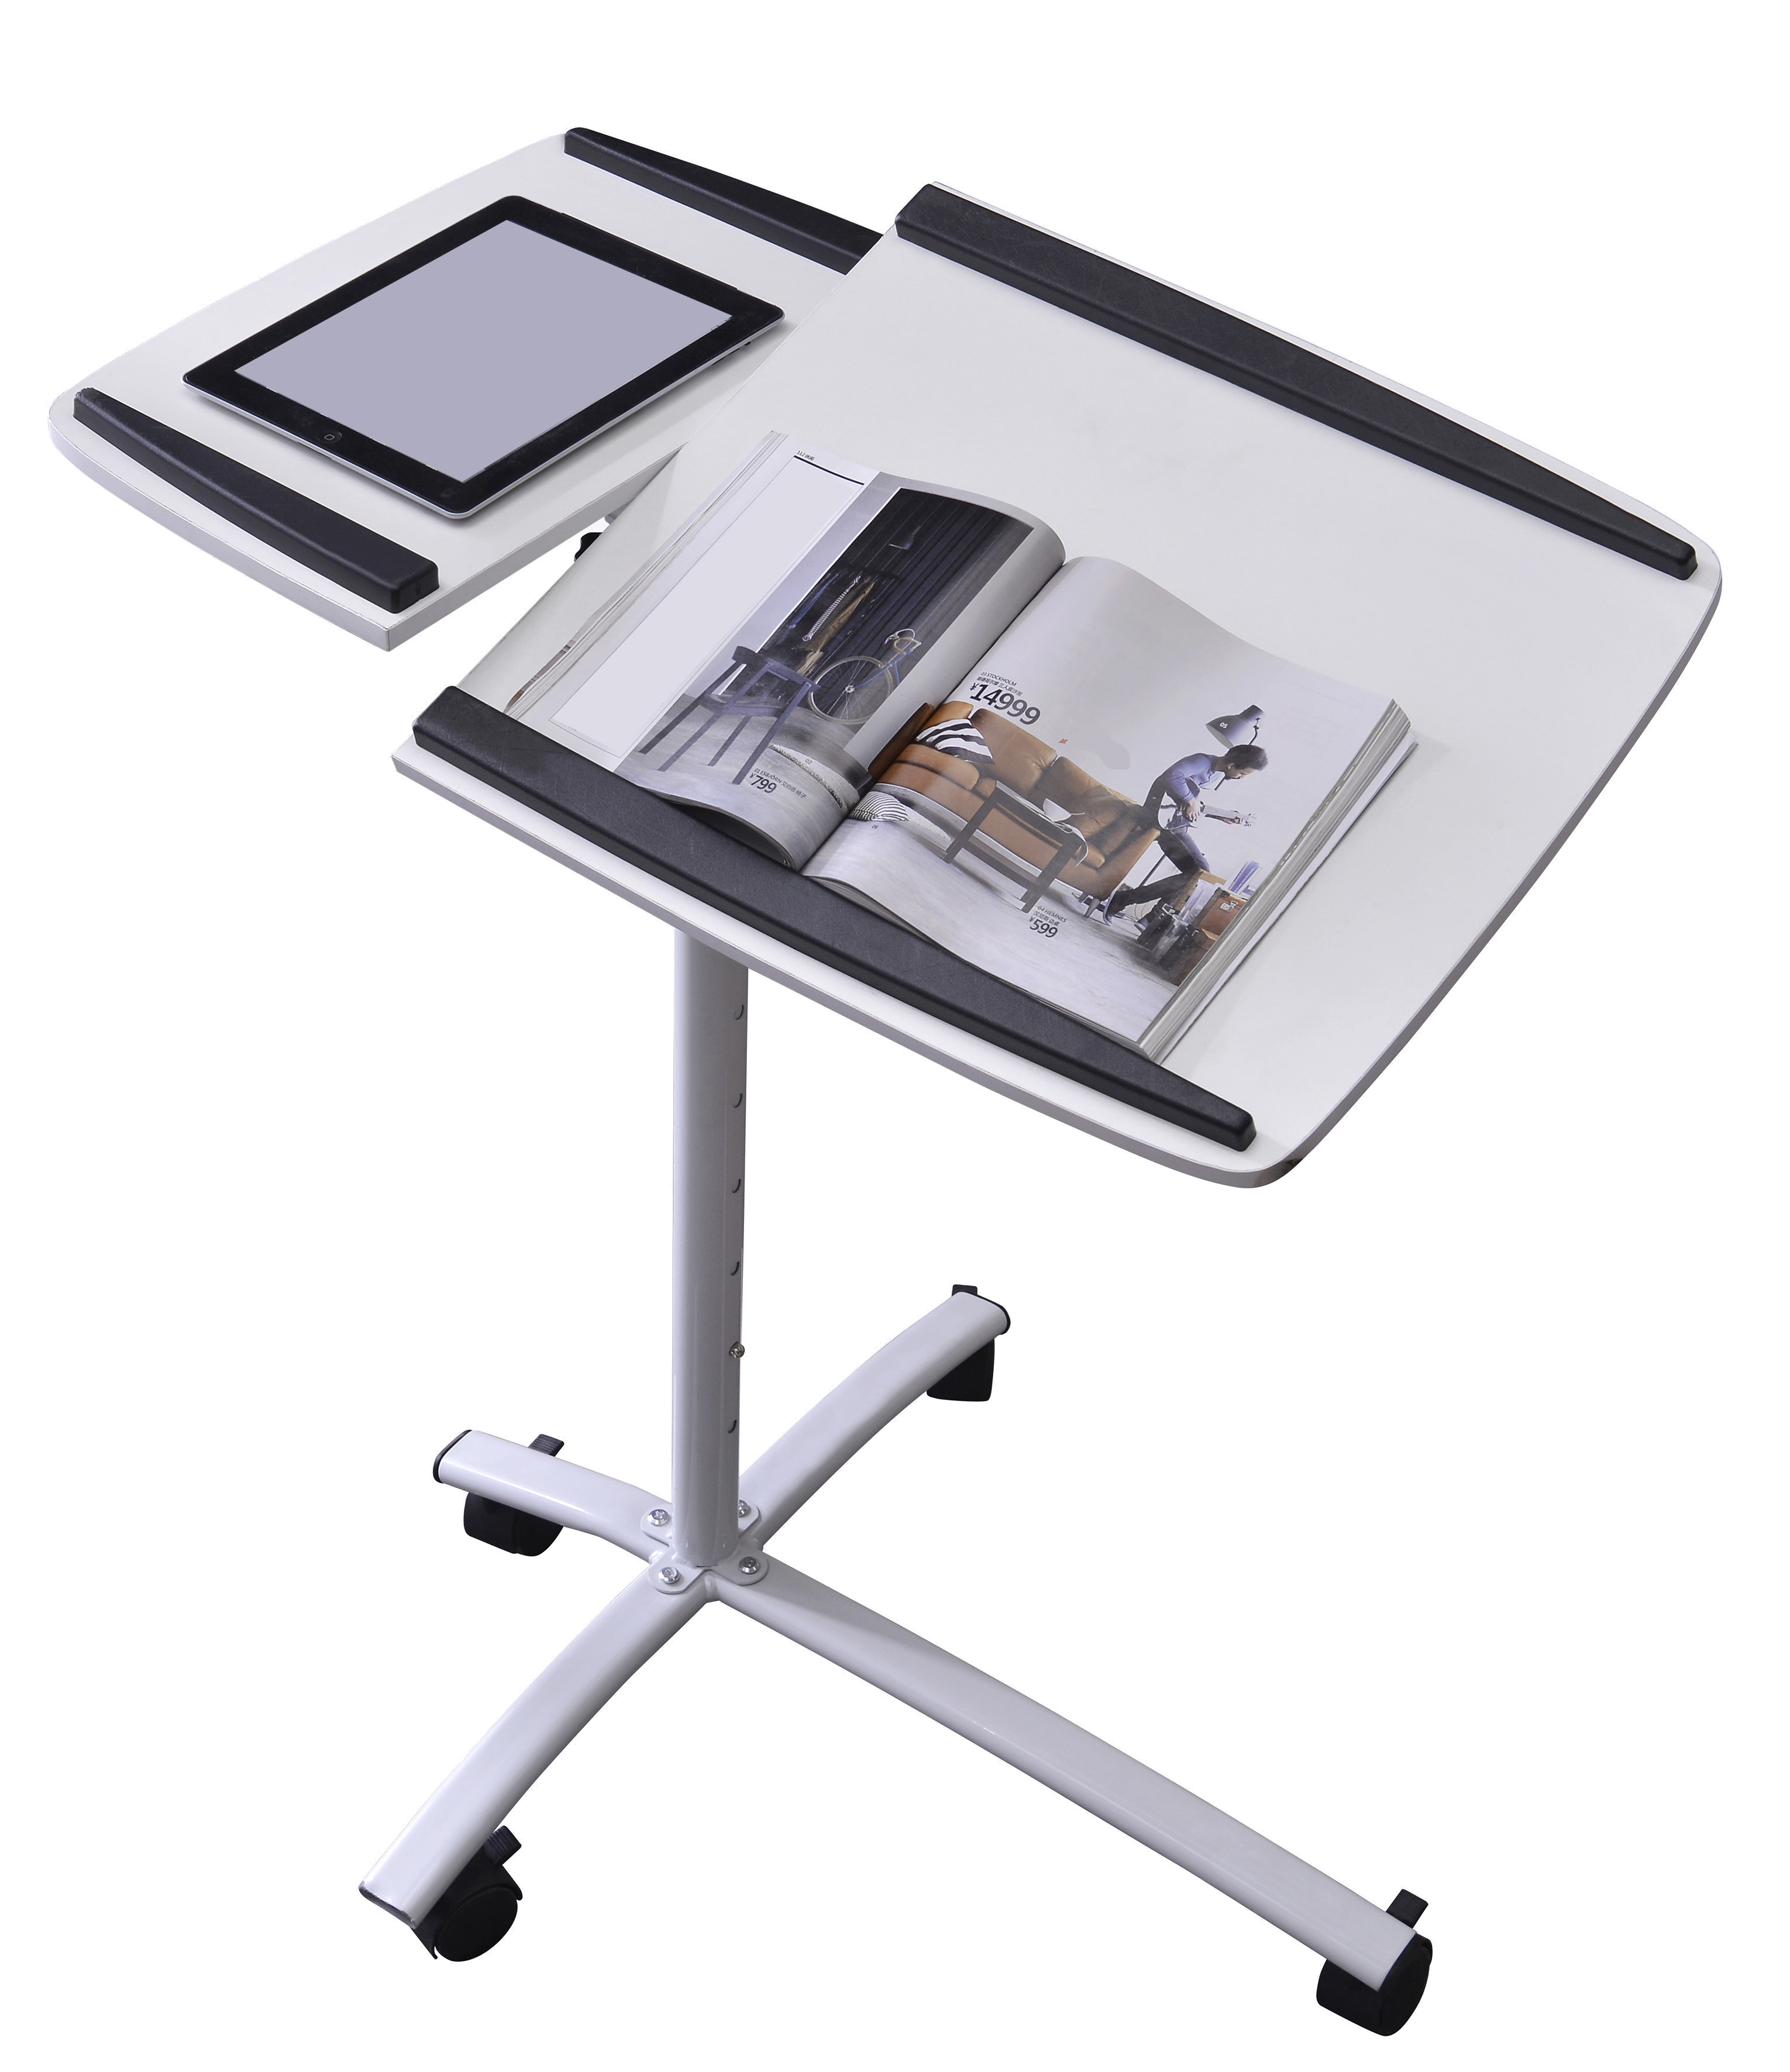 Sixbros Laptop Table Notebook Desk Adjustable Different